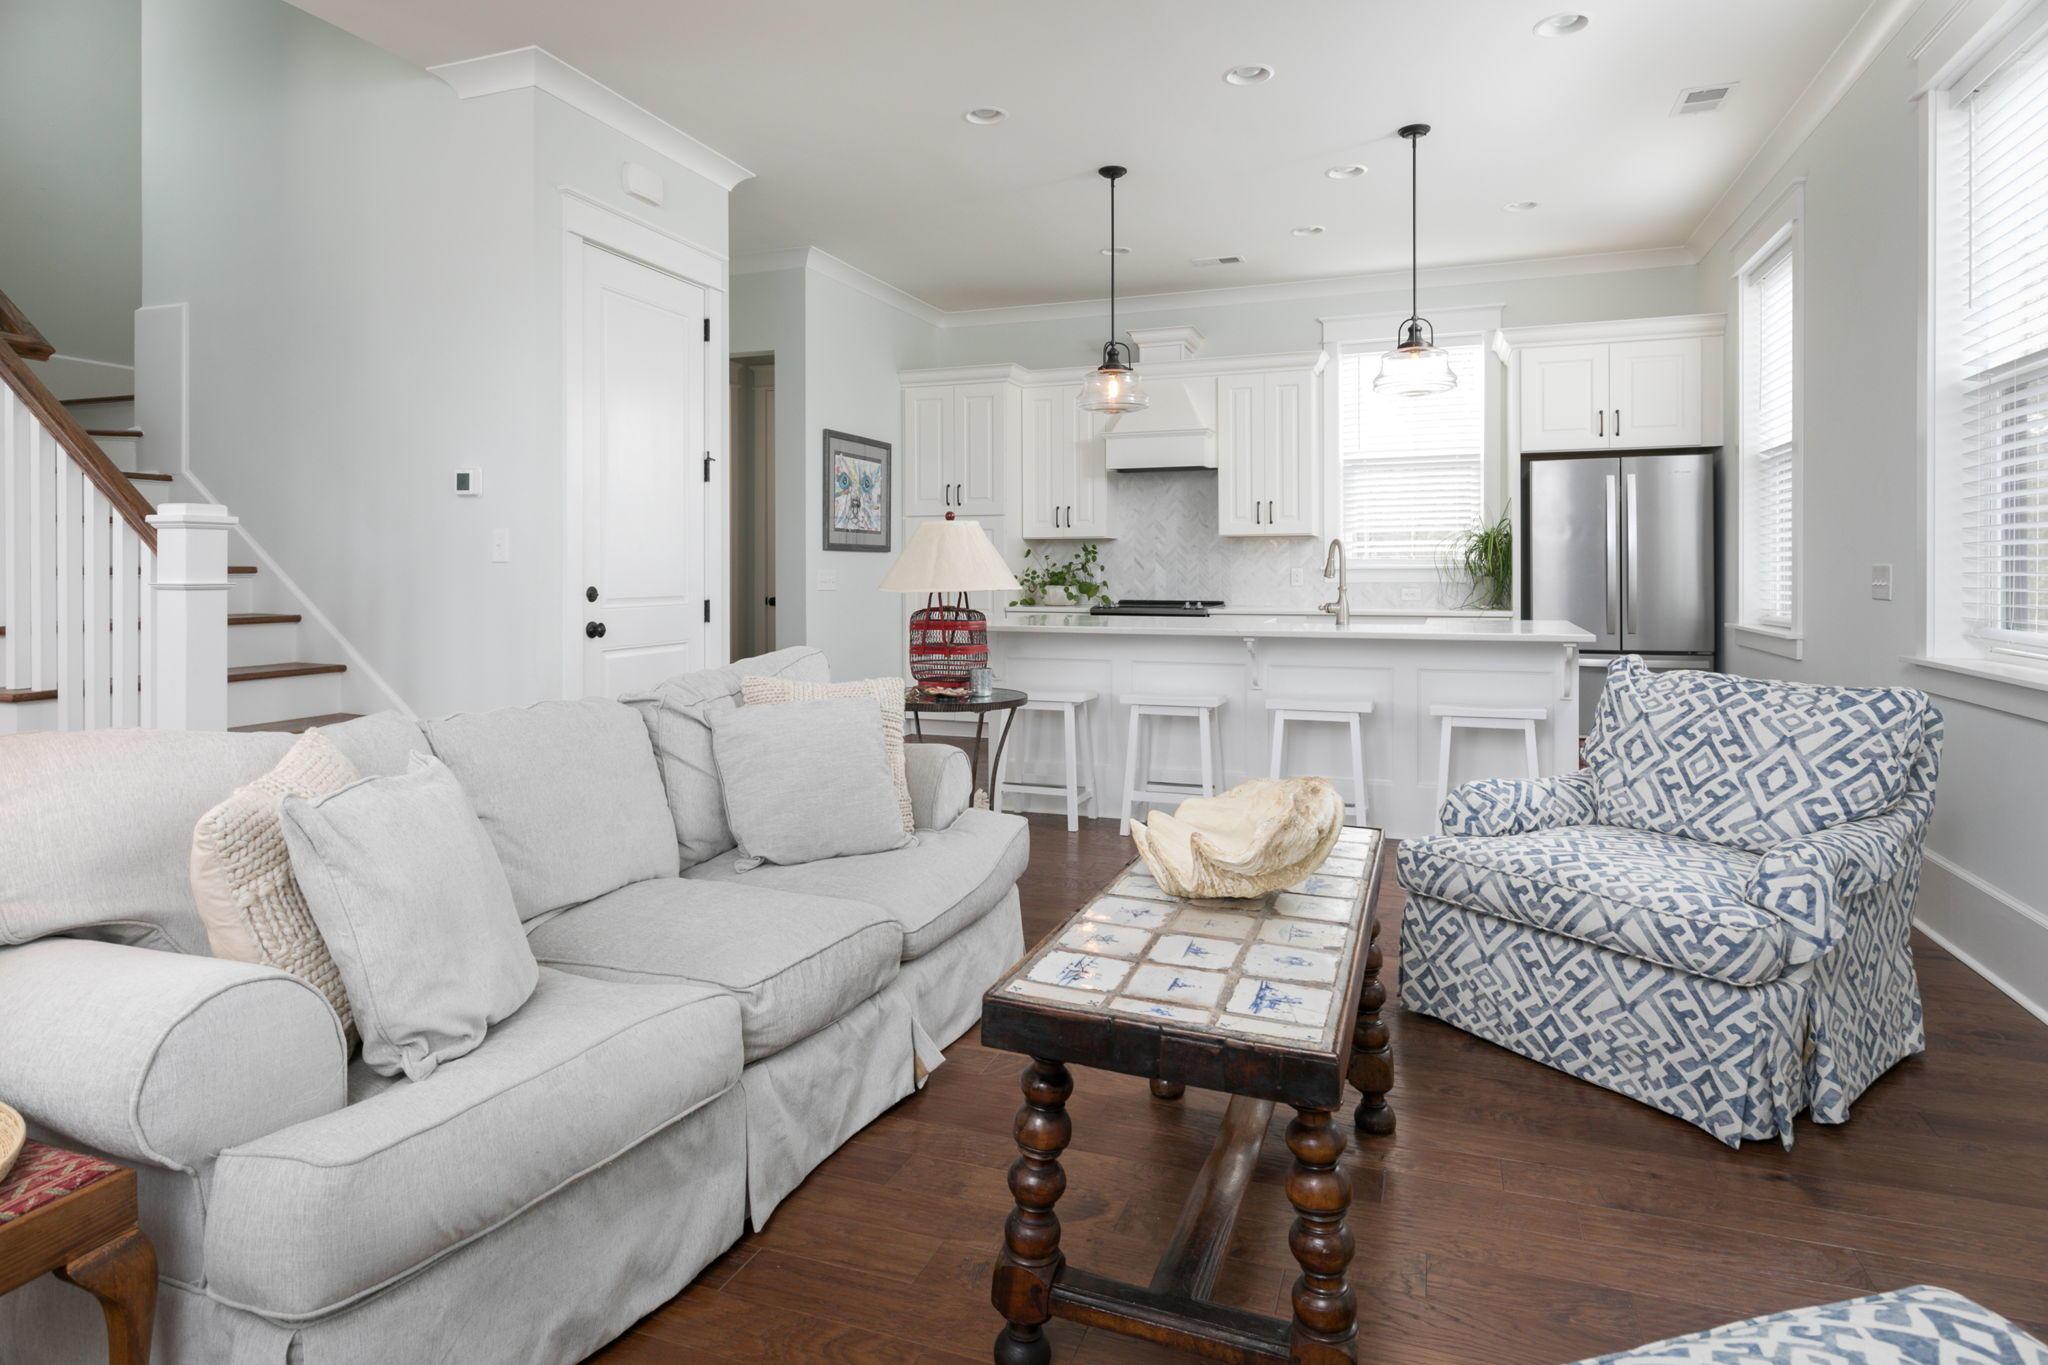 Sullivans Pointe Homes For Sale - 954 Key Colony, Mount Pleasant, SC - 29